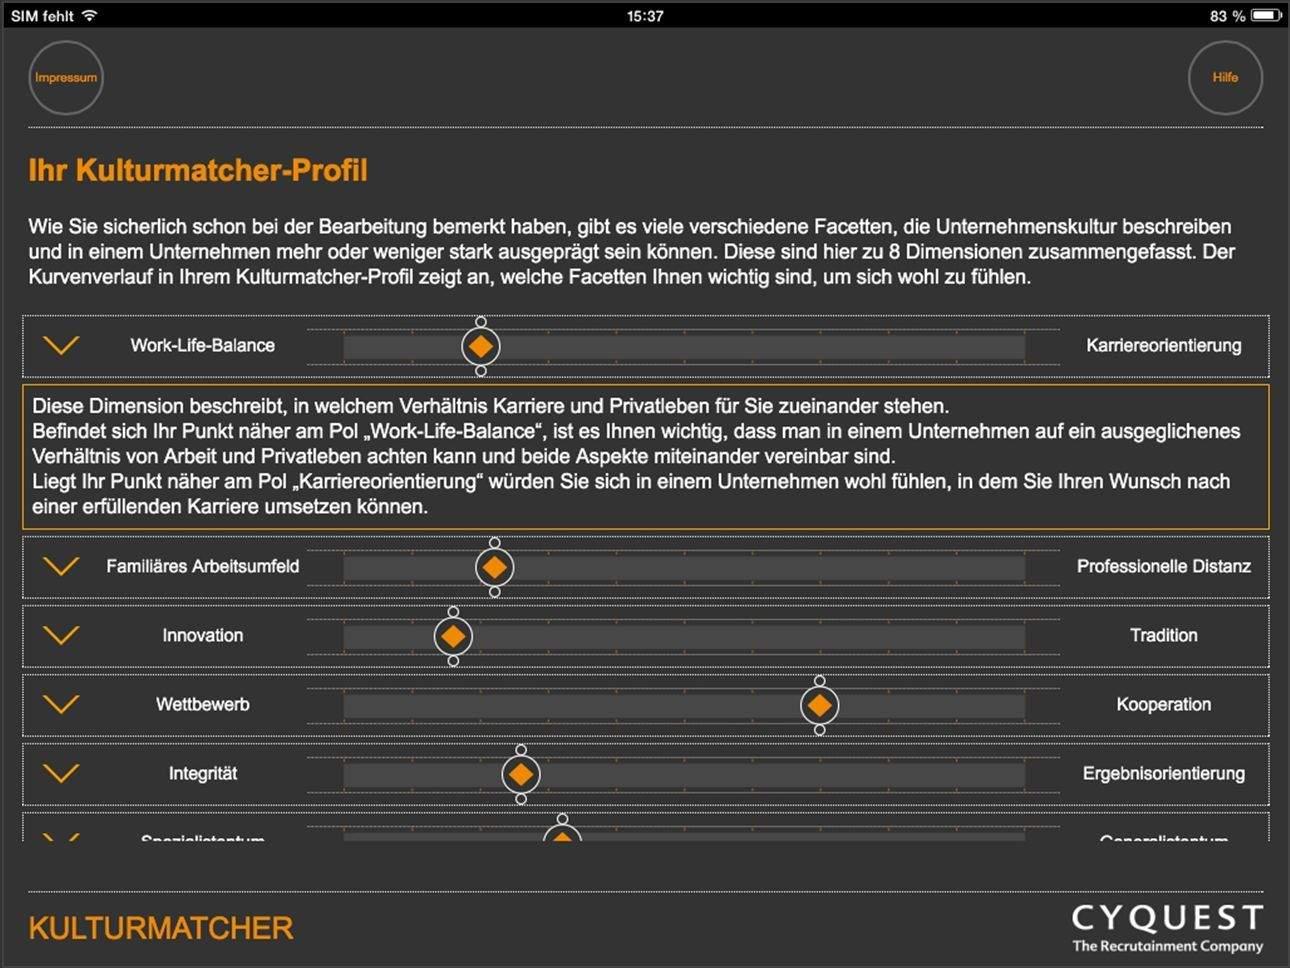 Beispiel-Profil 2 im Kulturmatcher.